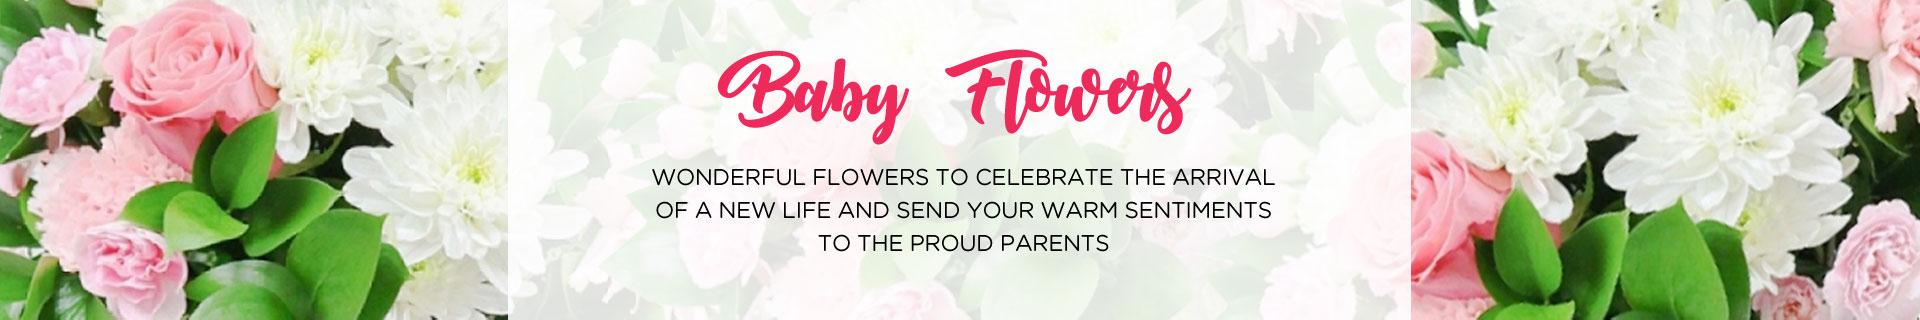 Baby Flowers